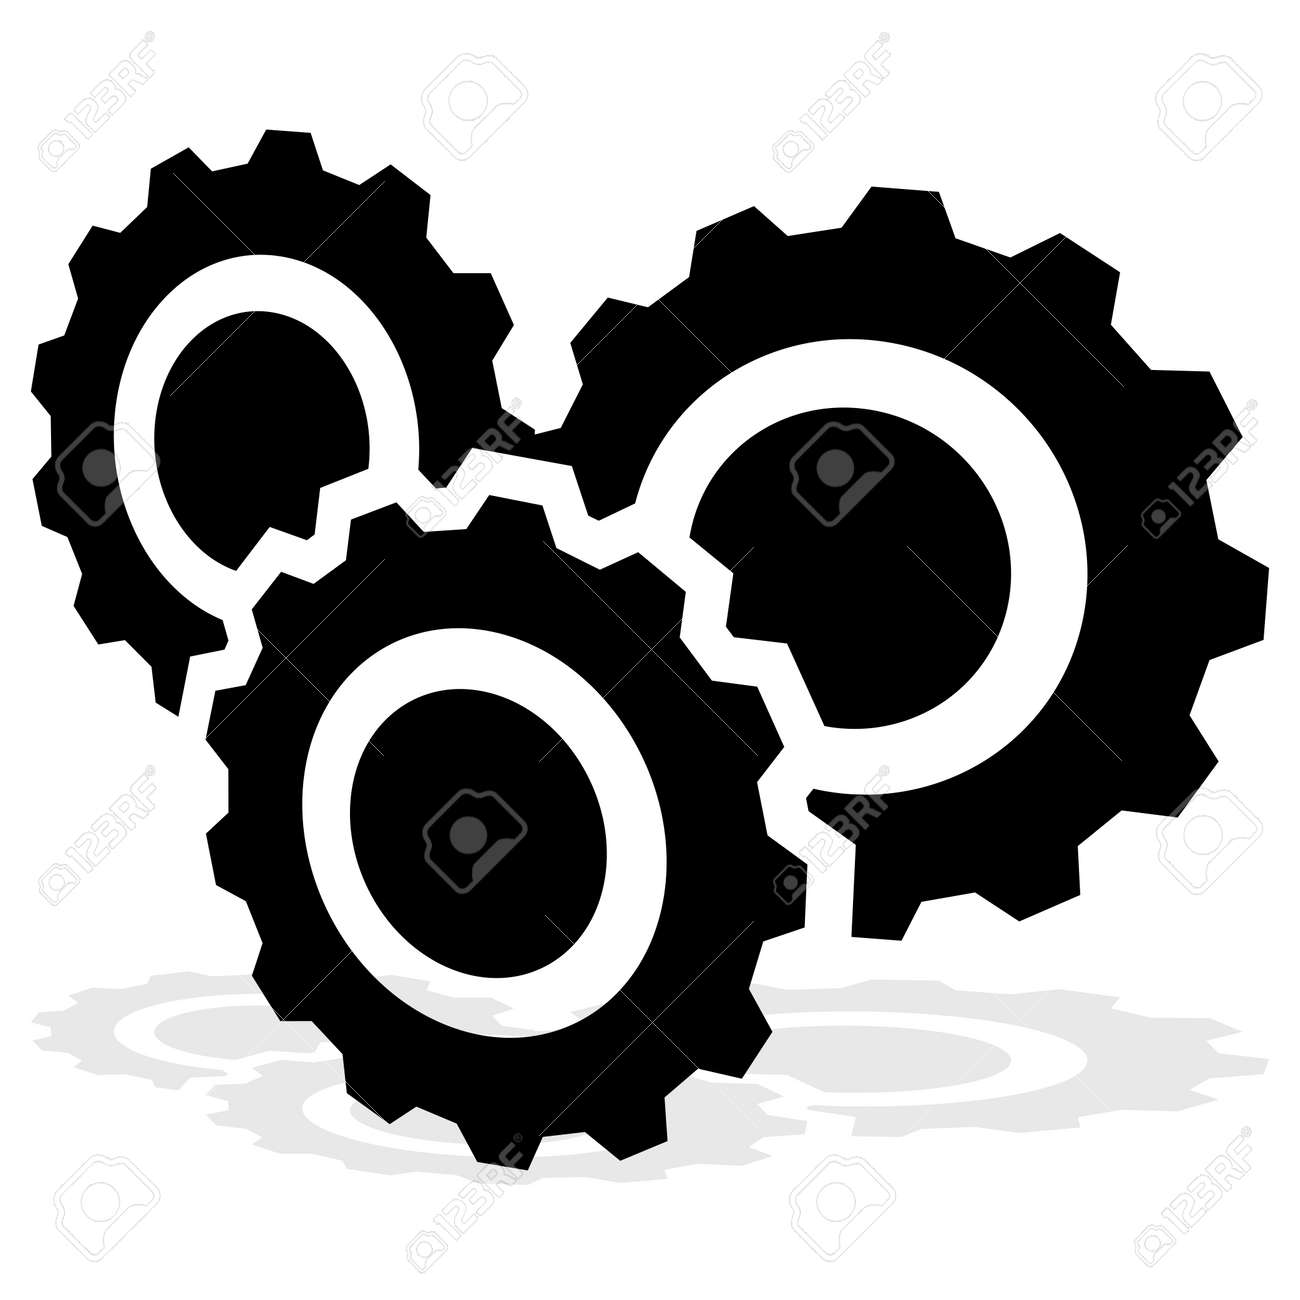 Gear, cogwheel, gearwheel icon, symbol and logo. Setup, customization, technical concept vector logo – Stock illustration, Clip-art graphics - 167486133